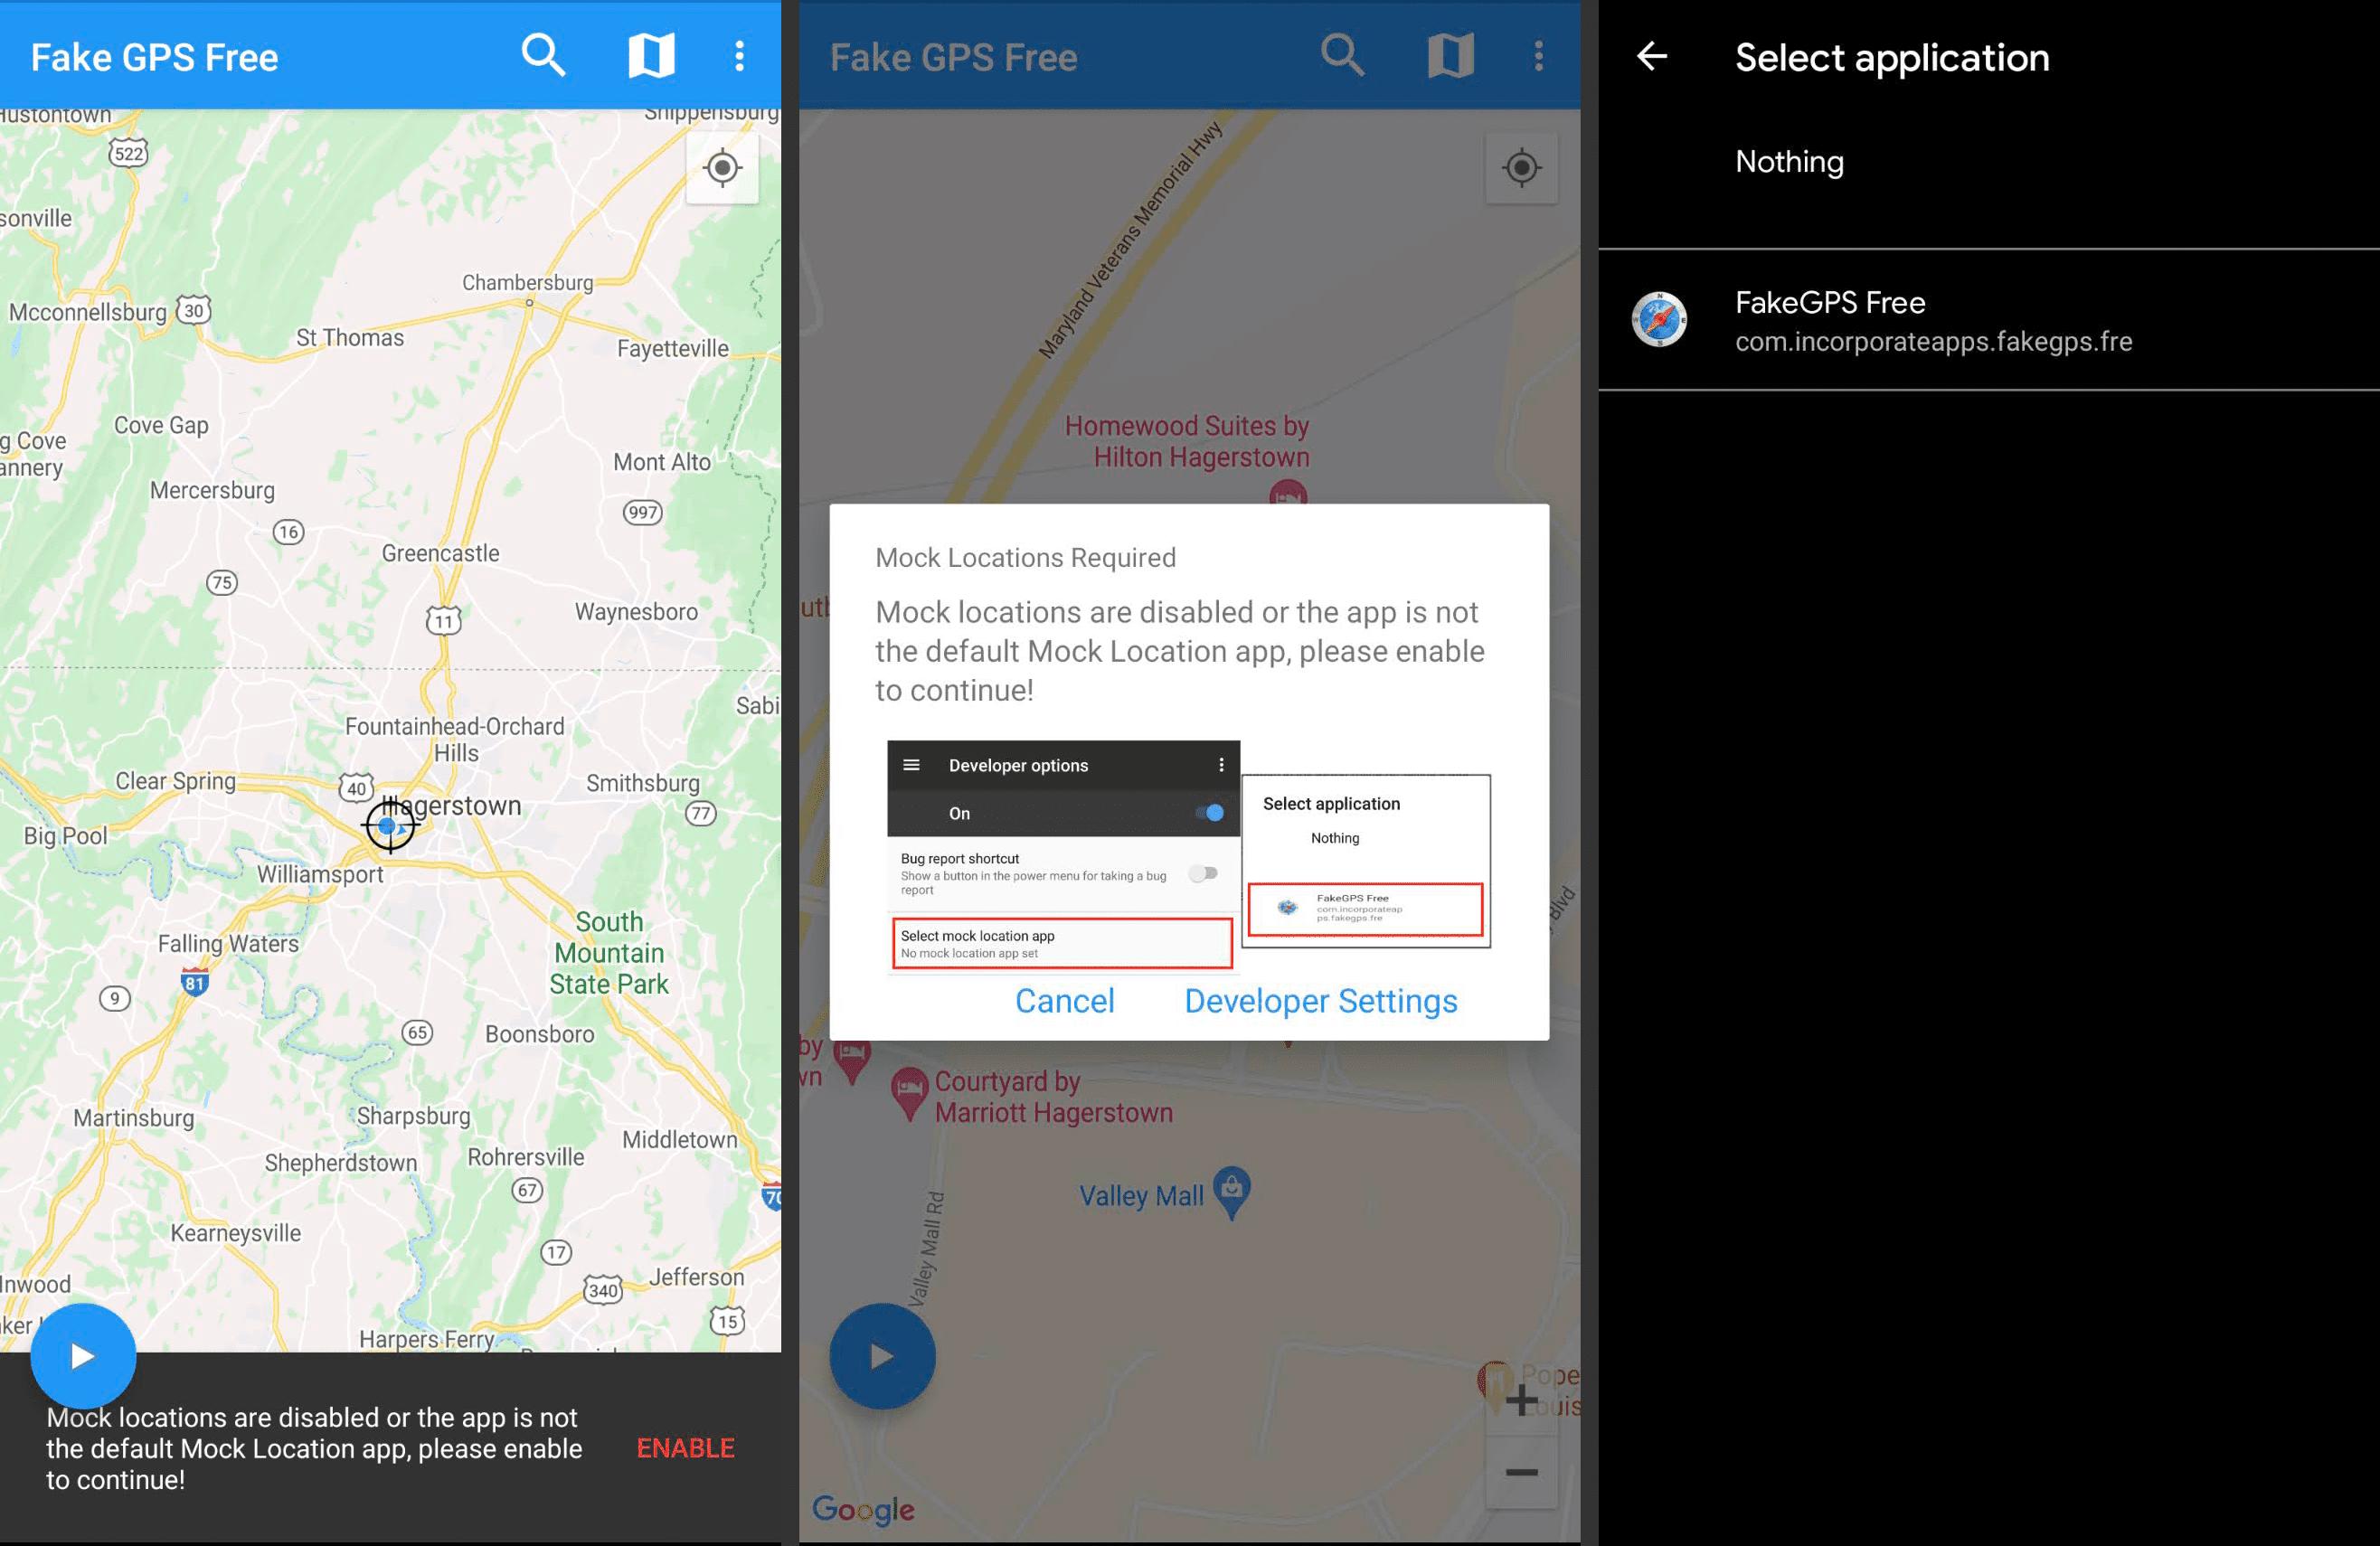 FakeGPS Free Android app screens